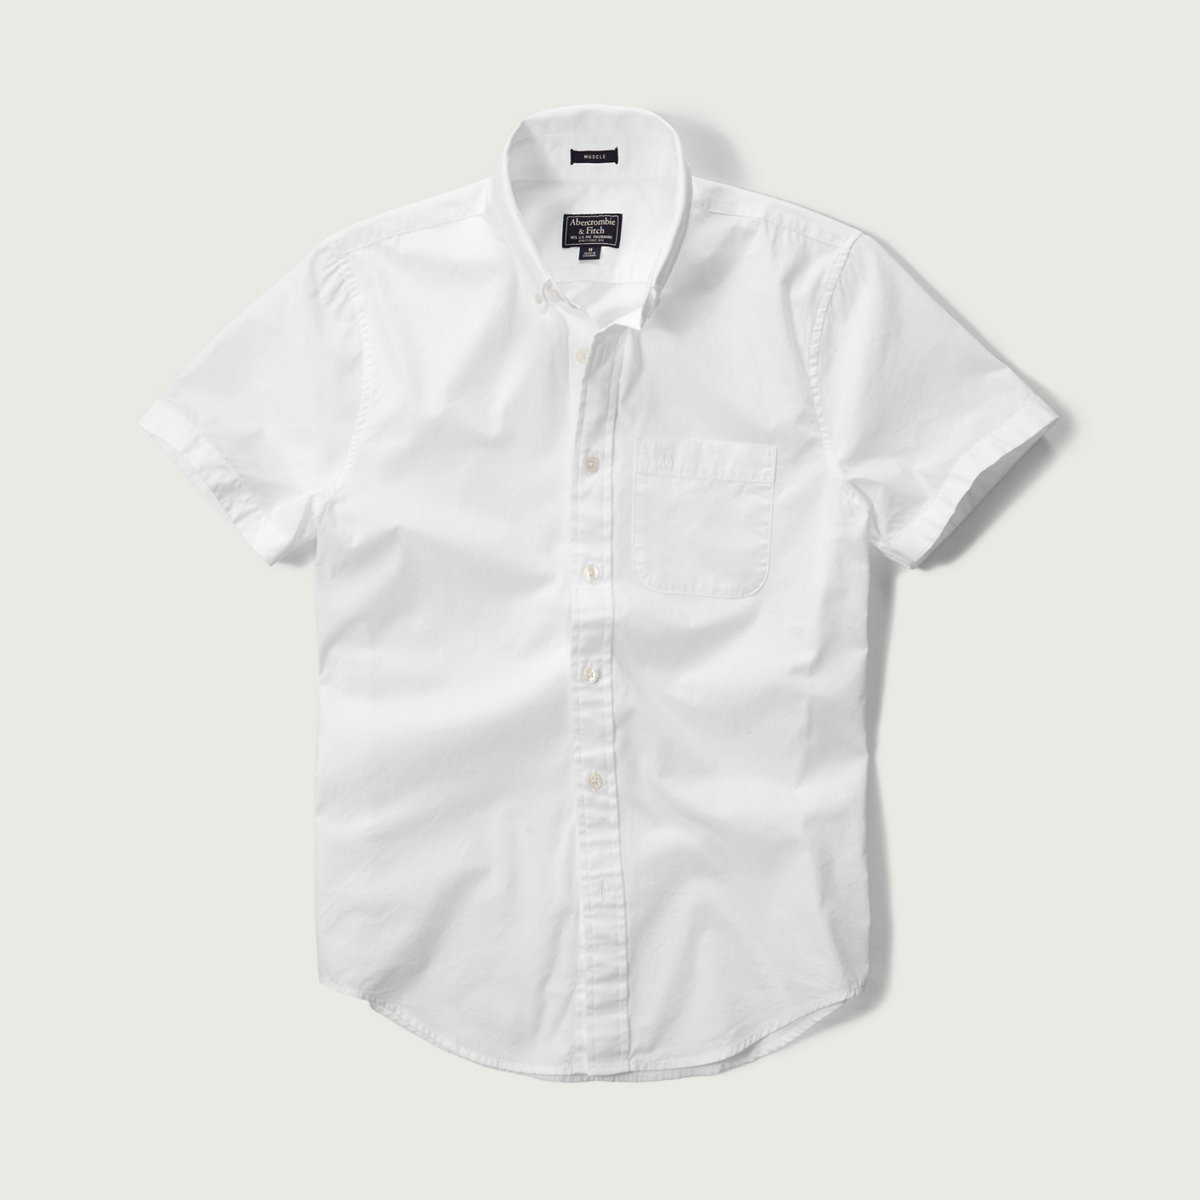 Iconic Poplin Short Sleeve Shirt